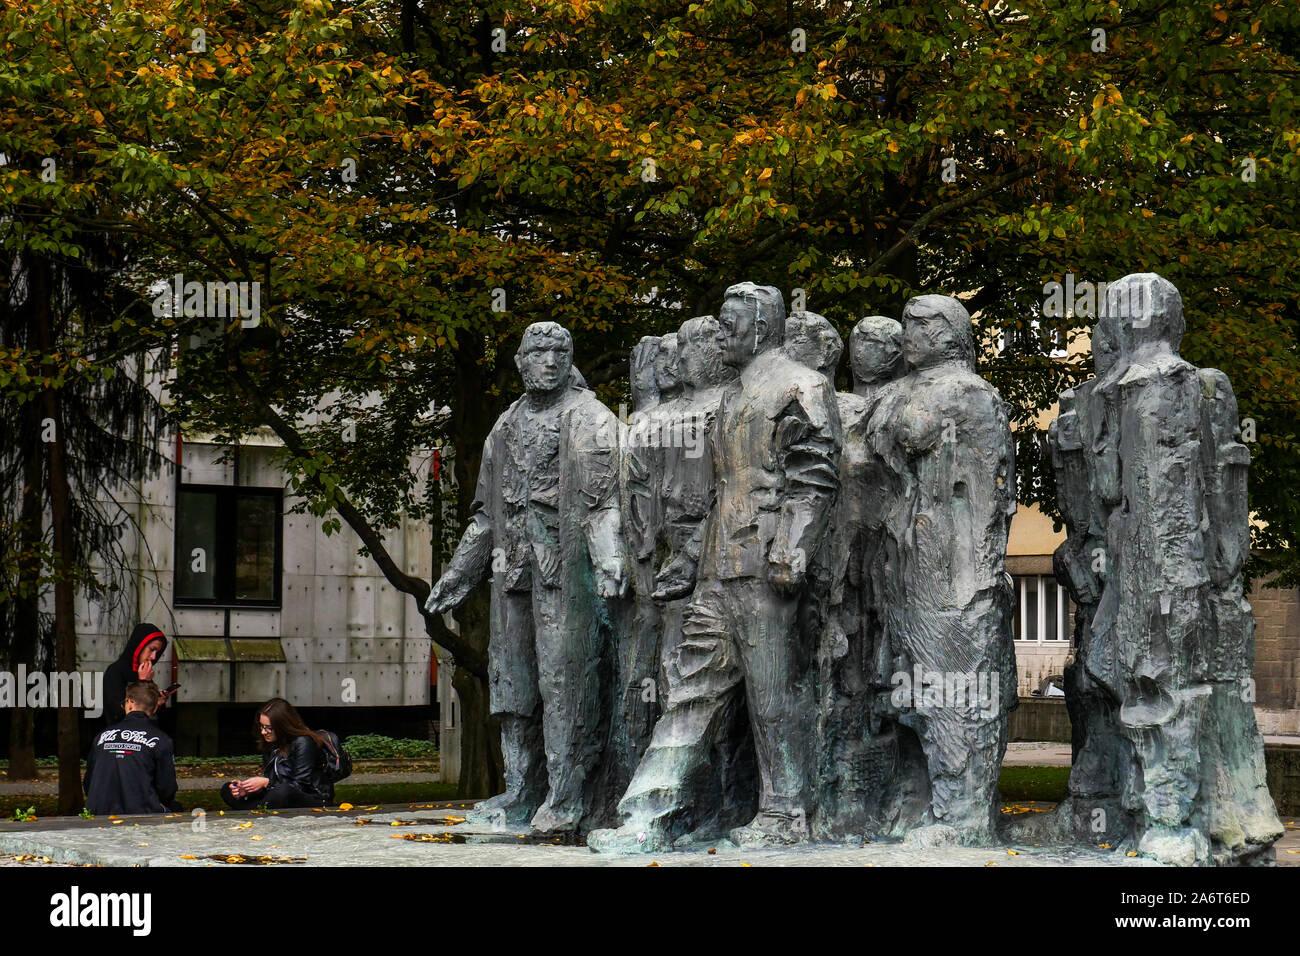 Monument To Edvardu Kardelju Spomenik Edvardu Kardelju Bronze